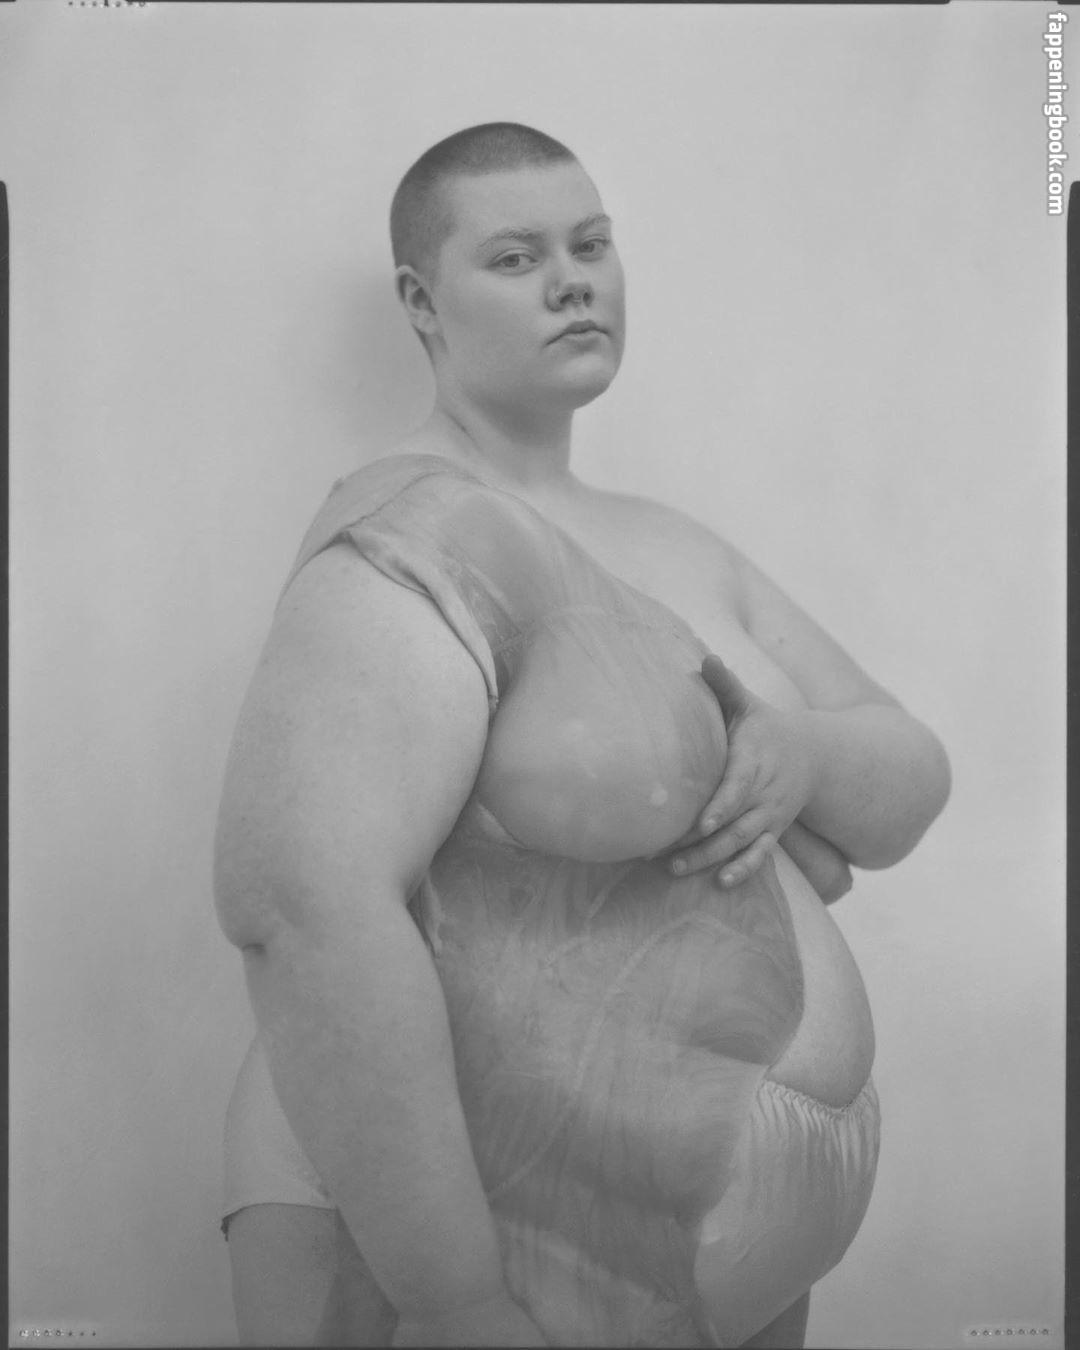 nackt Halldorudottir Isold Gigi Hari,